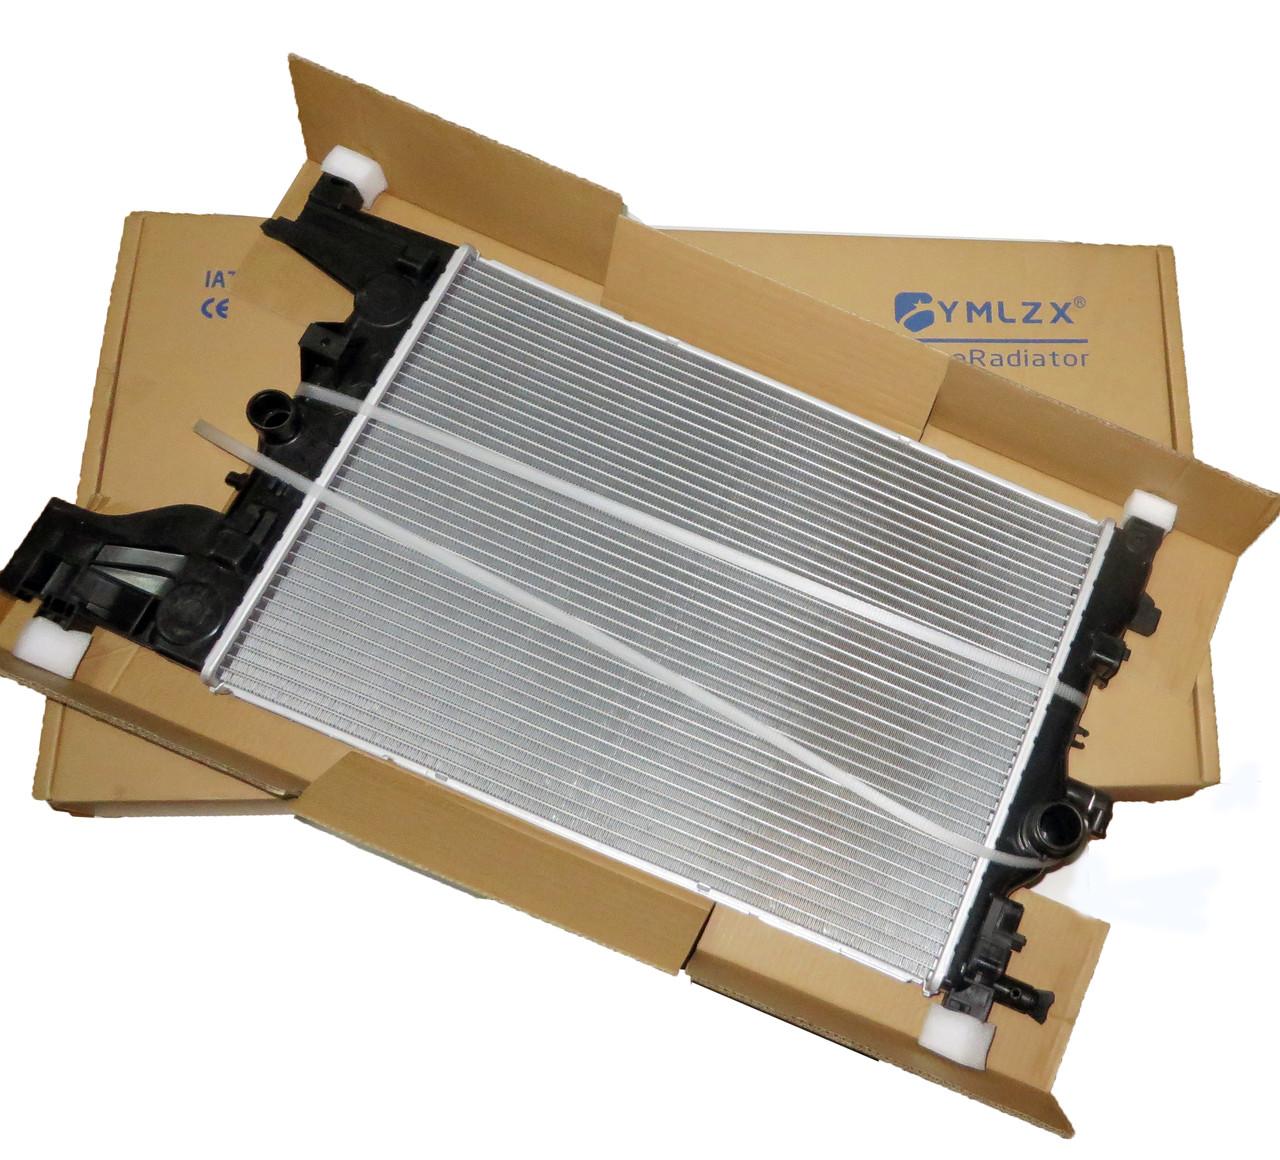 Радиатор основной Круз 1,6 МКПП, YMLZX, YML-BR-946, 13267650-